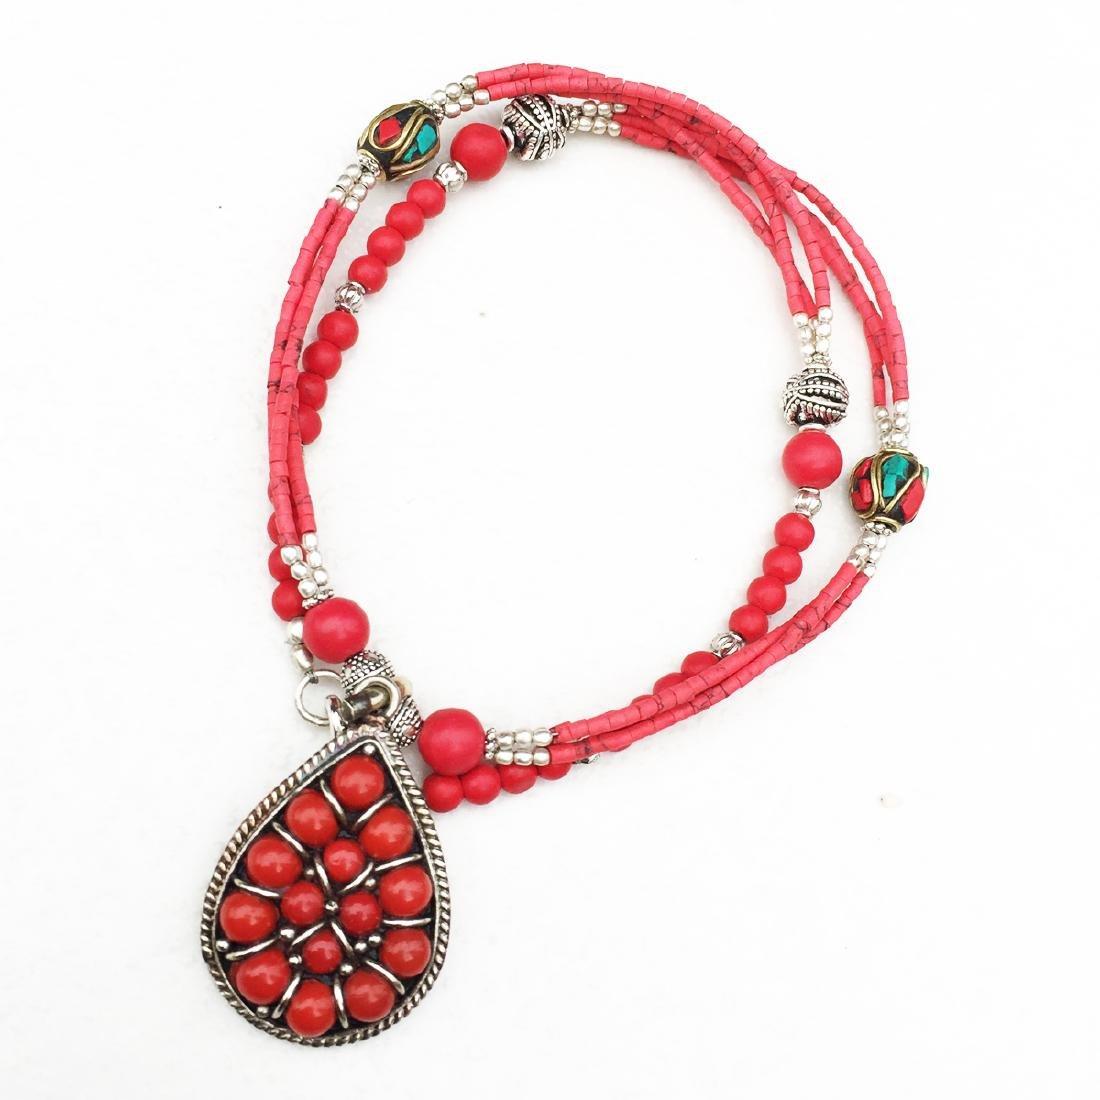 Nepali Handmade Tibetan Turquoise & Coral Necklace